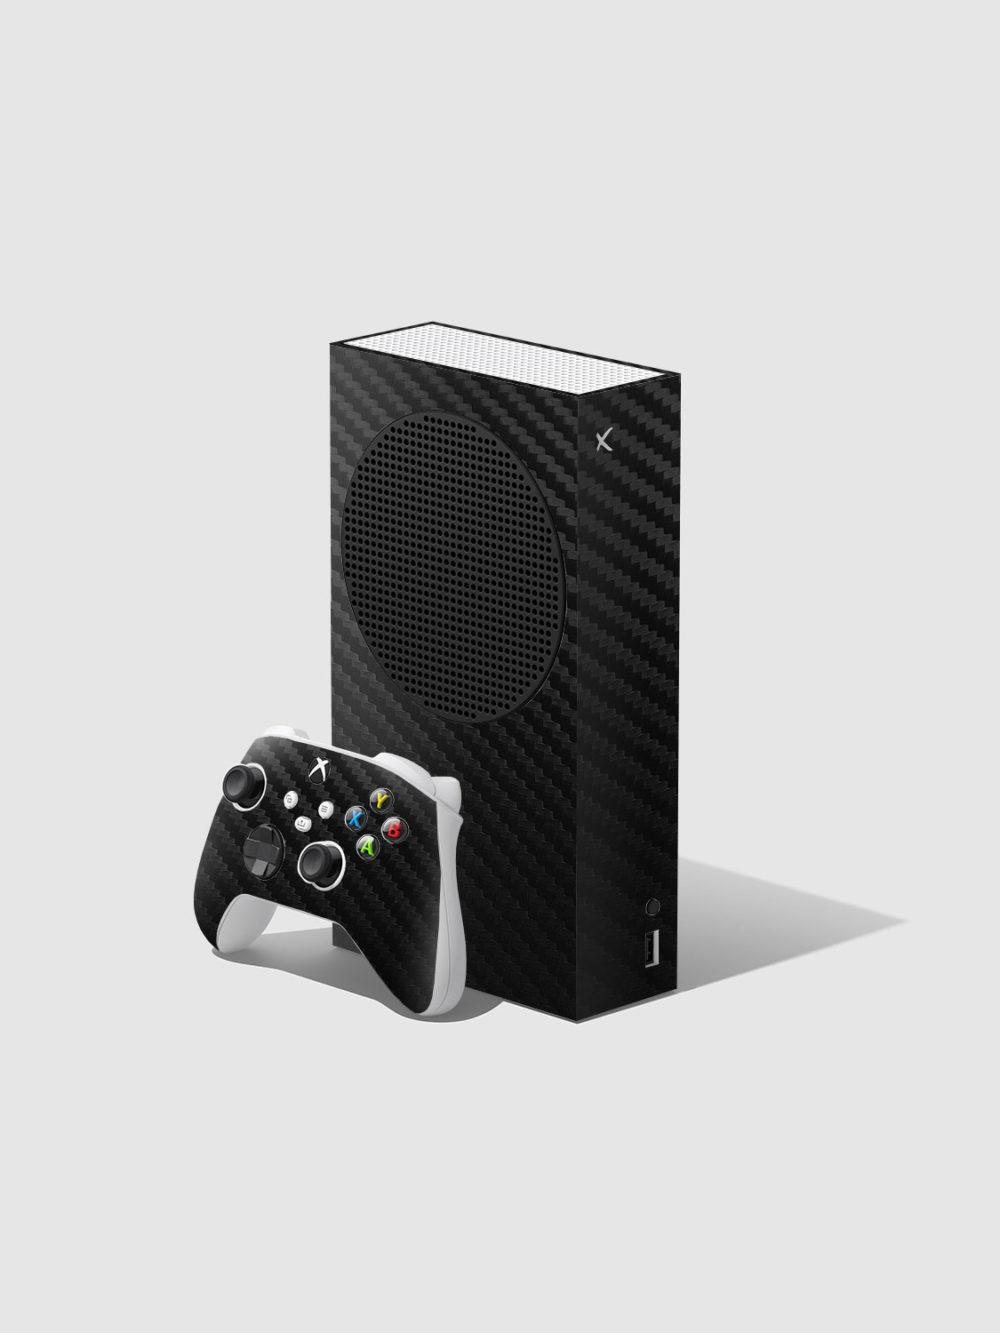 Black Carbon Fibre Xbox Series S Console and Controller Skin Wrap